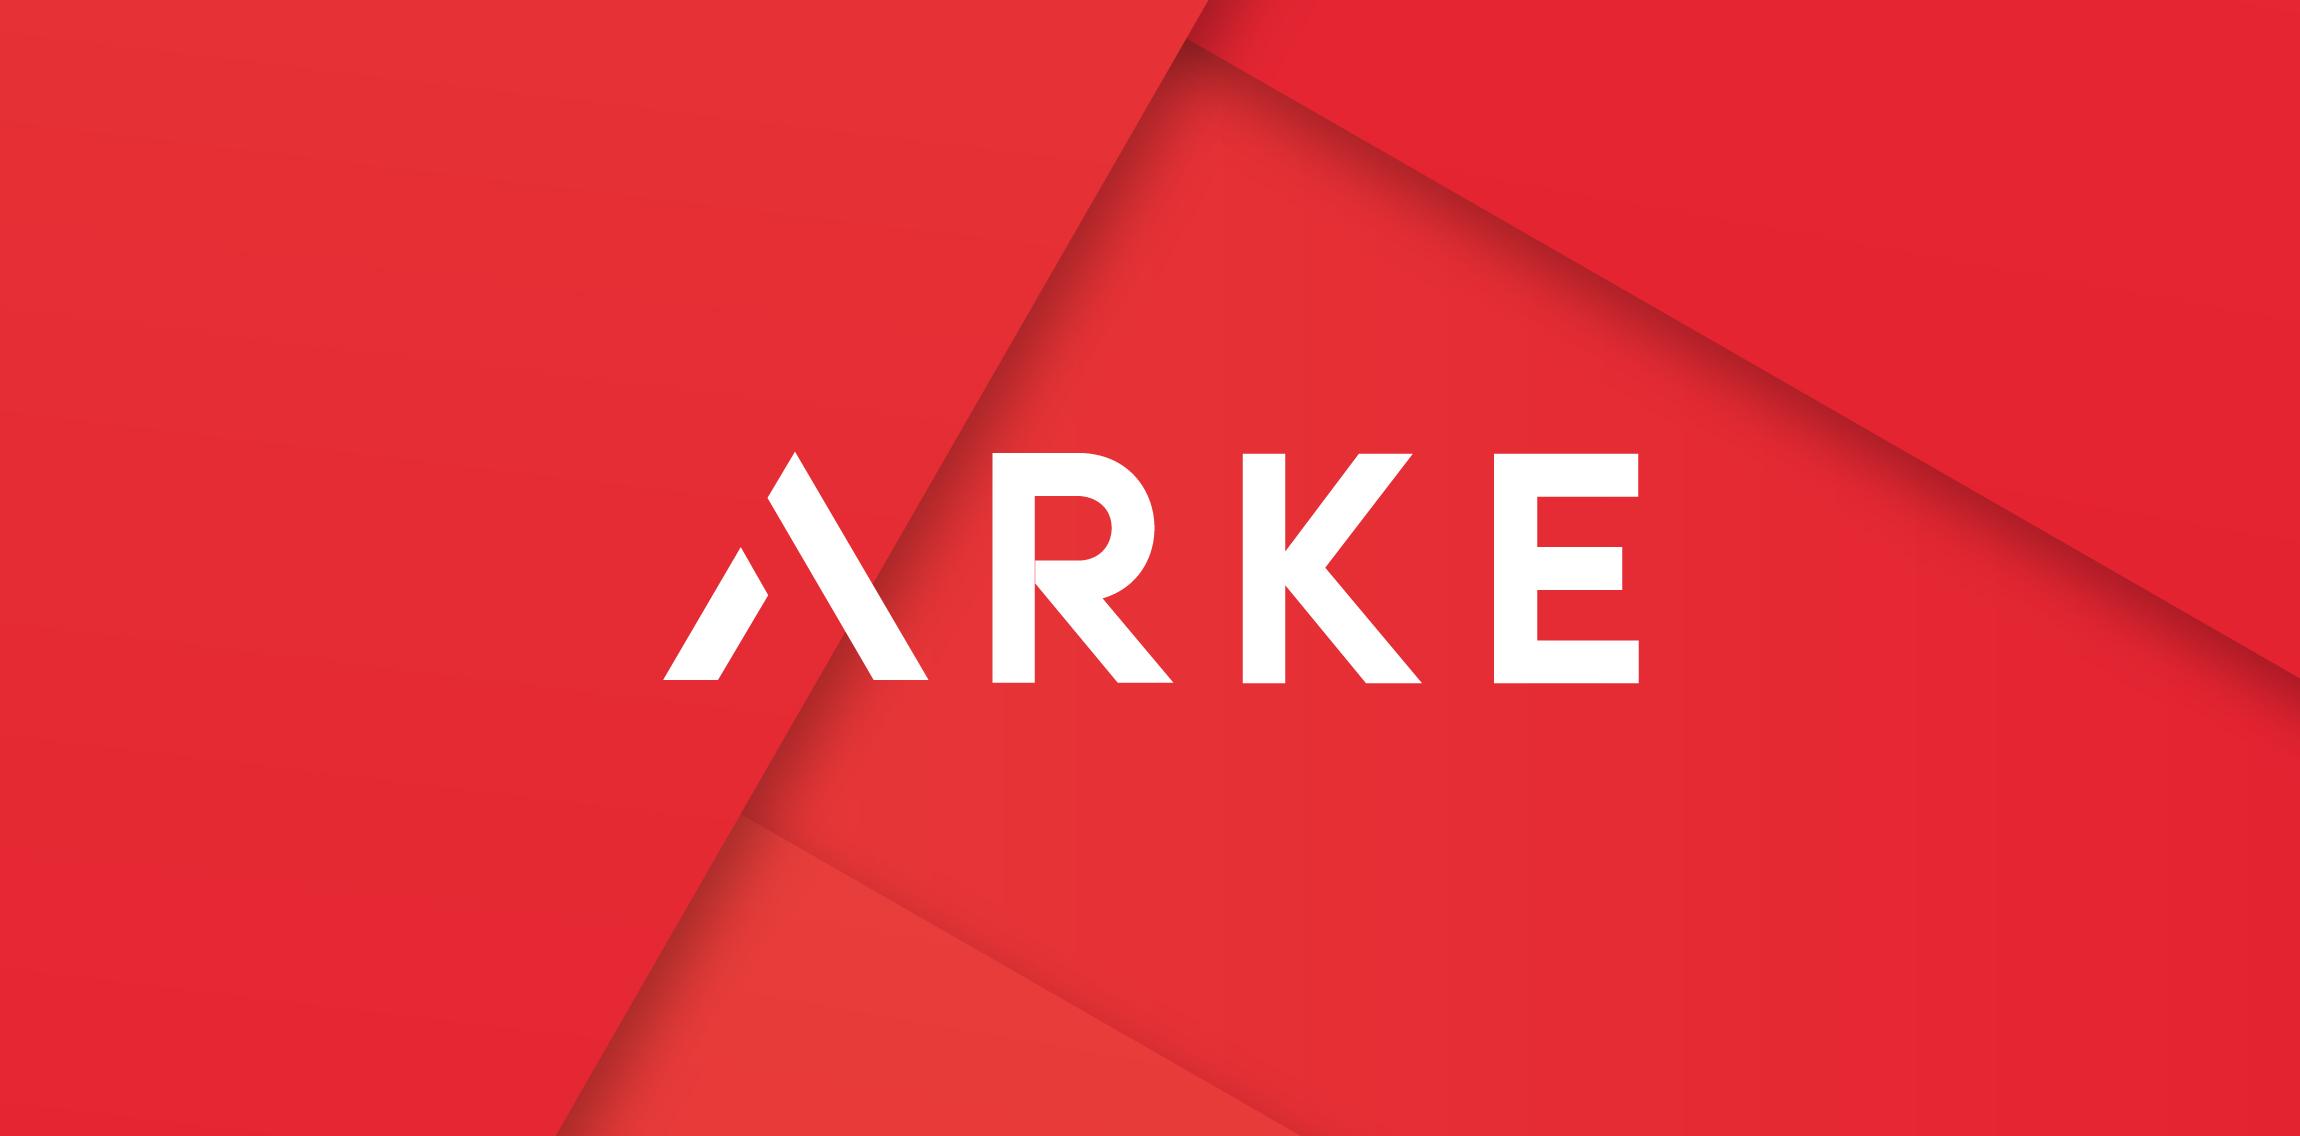 Arke | LogoMoose - Logo Inspiration